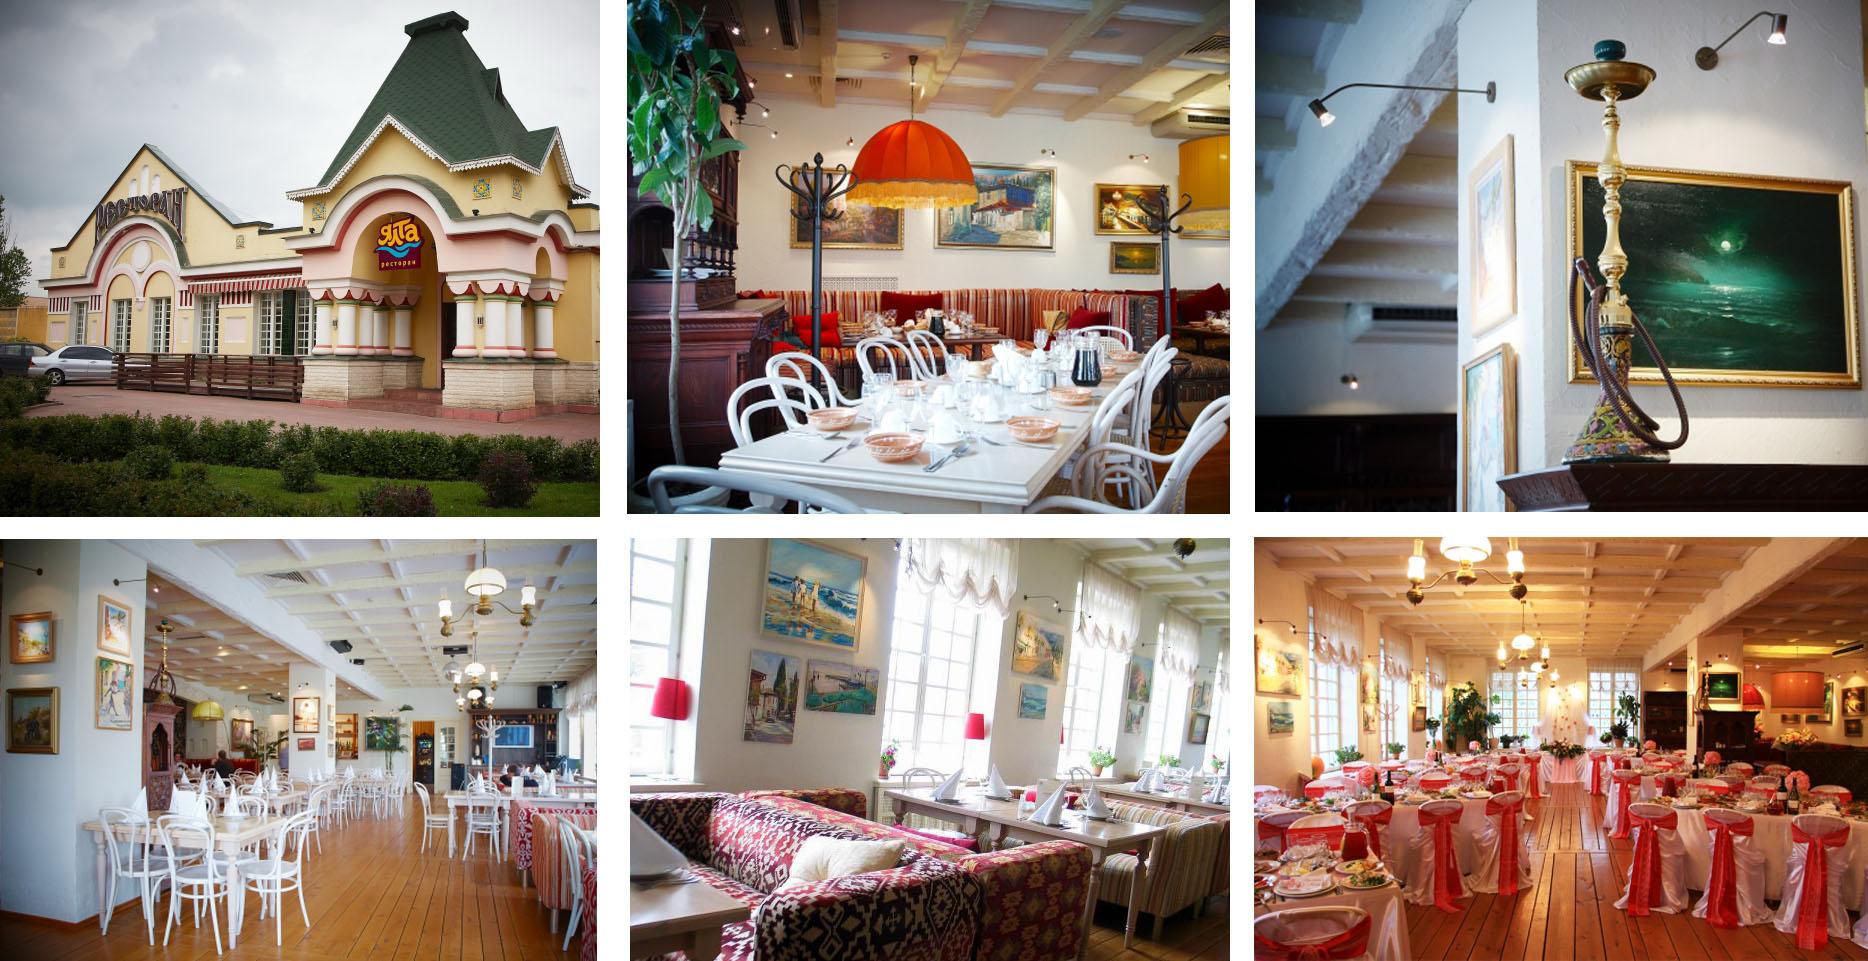 меню ресторана пушкин в москве фото